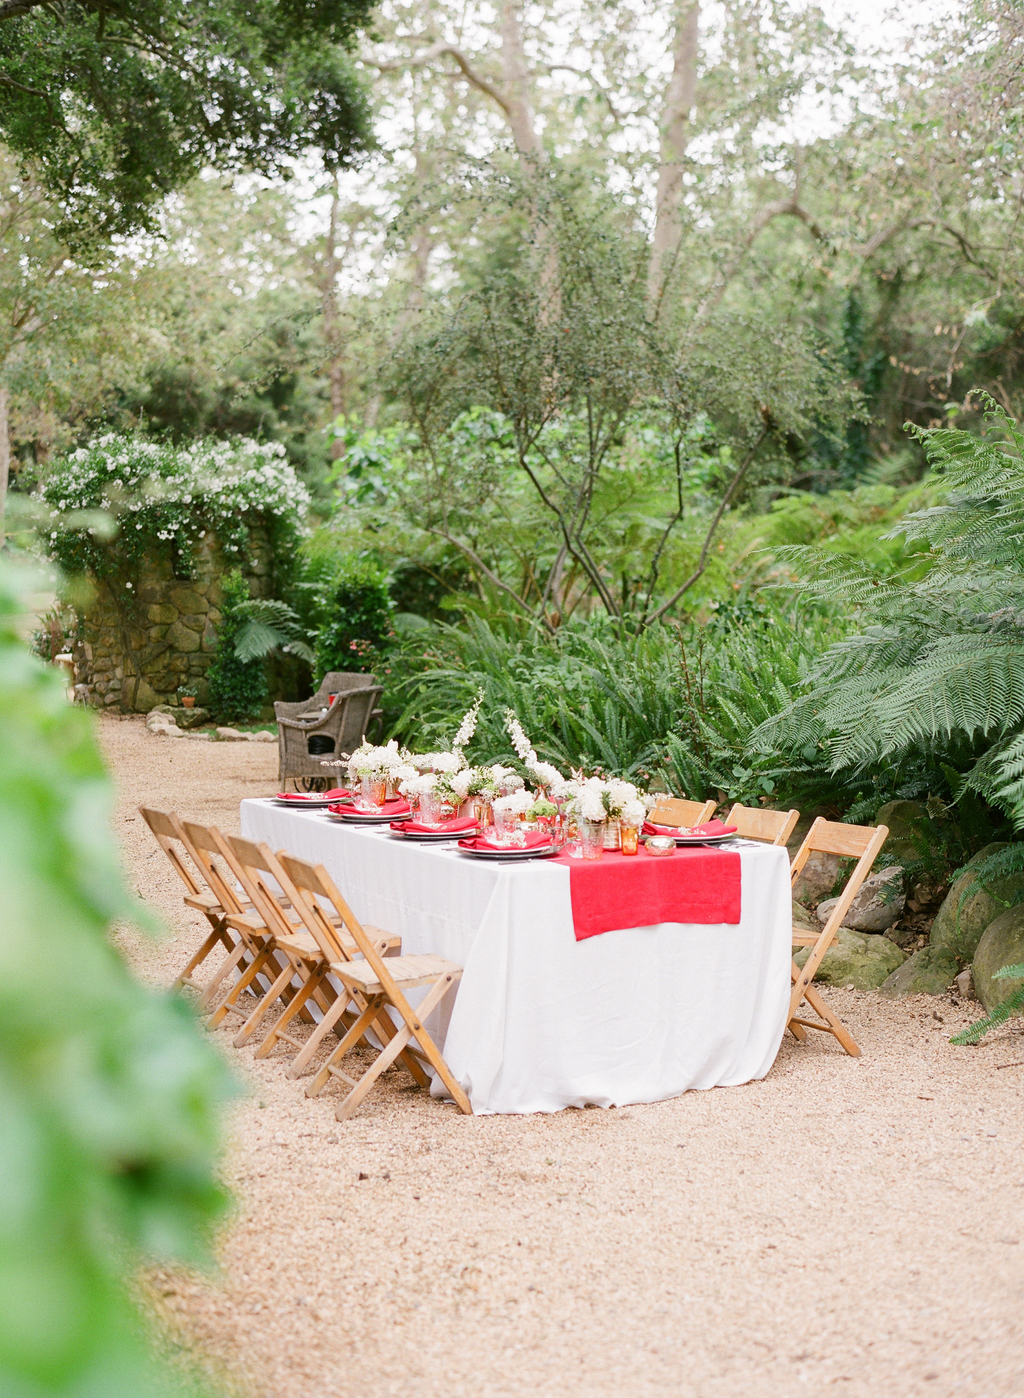 Styled-wedding-santa-barbara-chic-beaux-arts-photographie-italian-bohemian-wedding-venue-table-setting-red-white-flowers-antique-glass-068.full